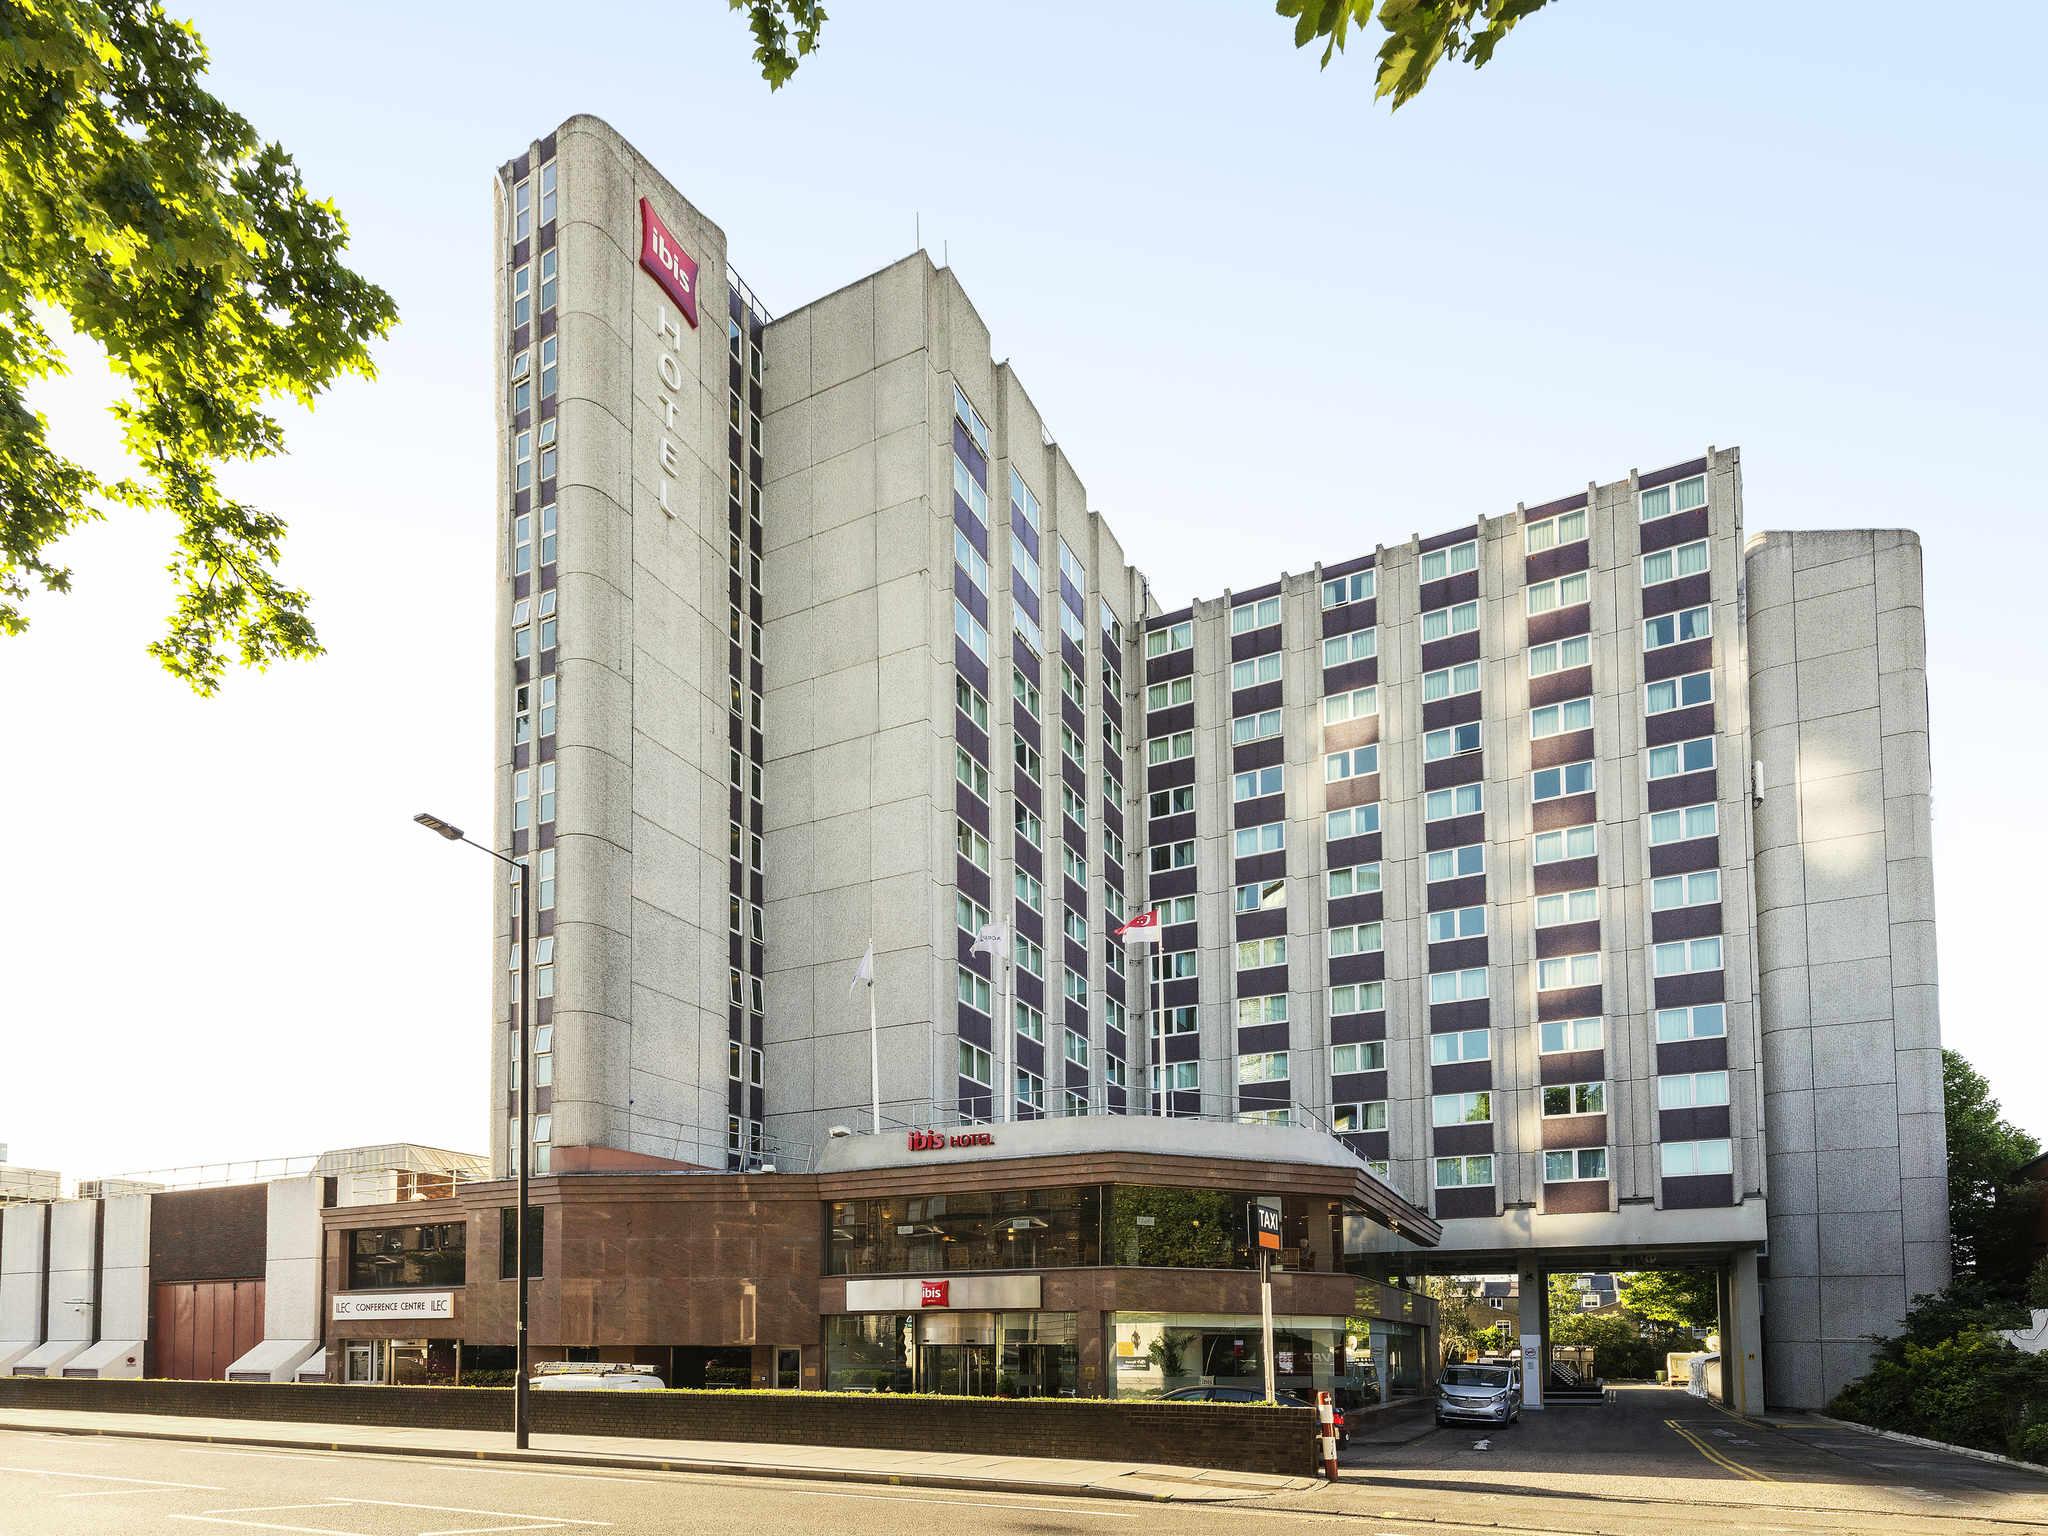 Hotel – ibis London Earls Court